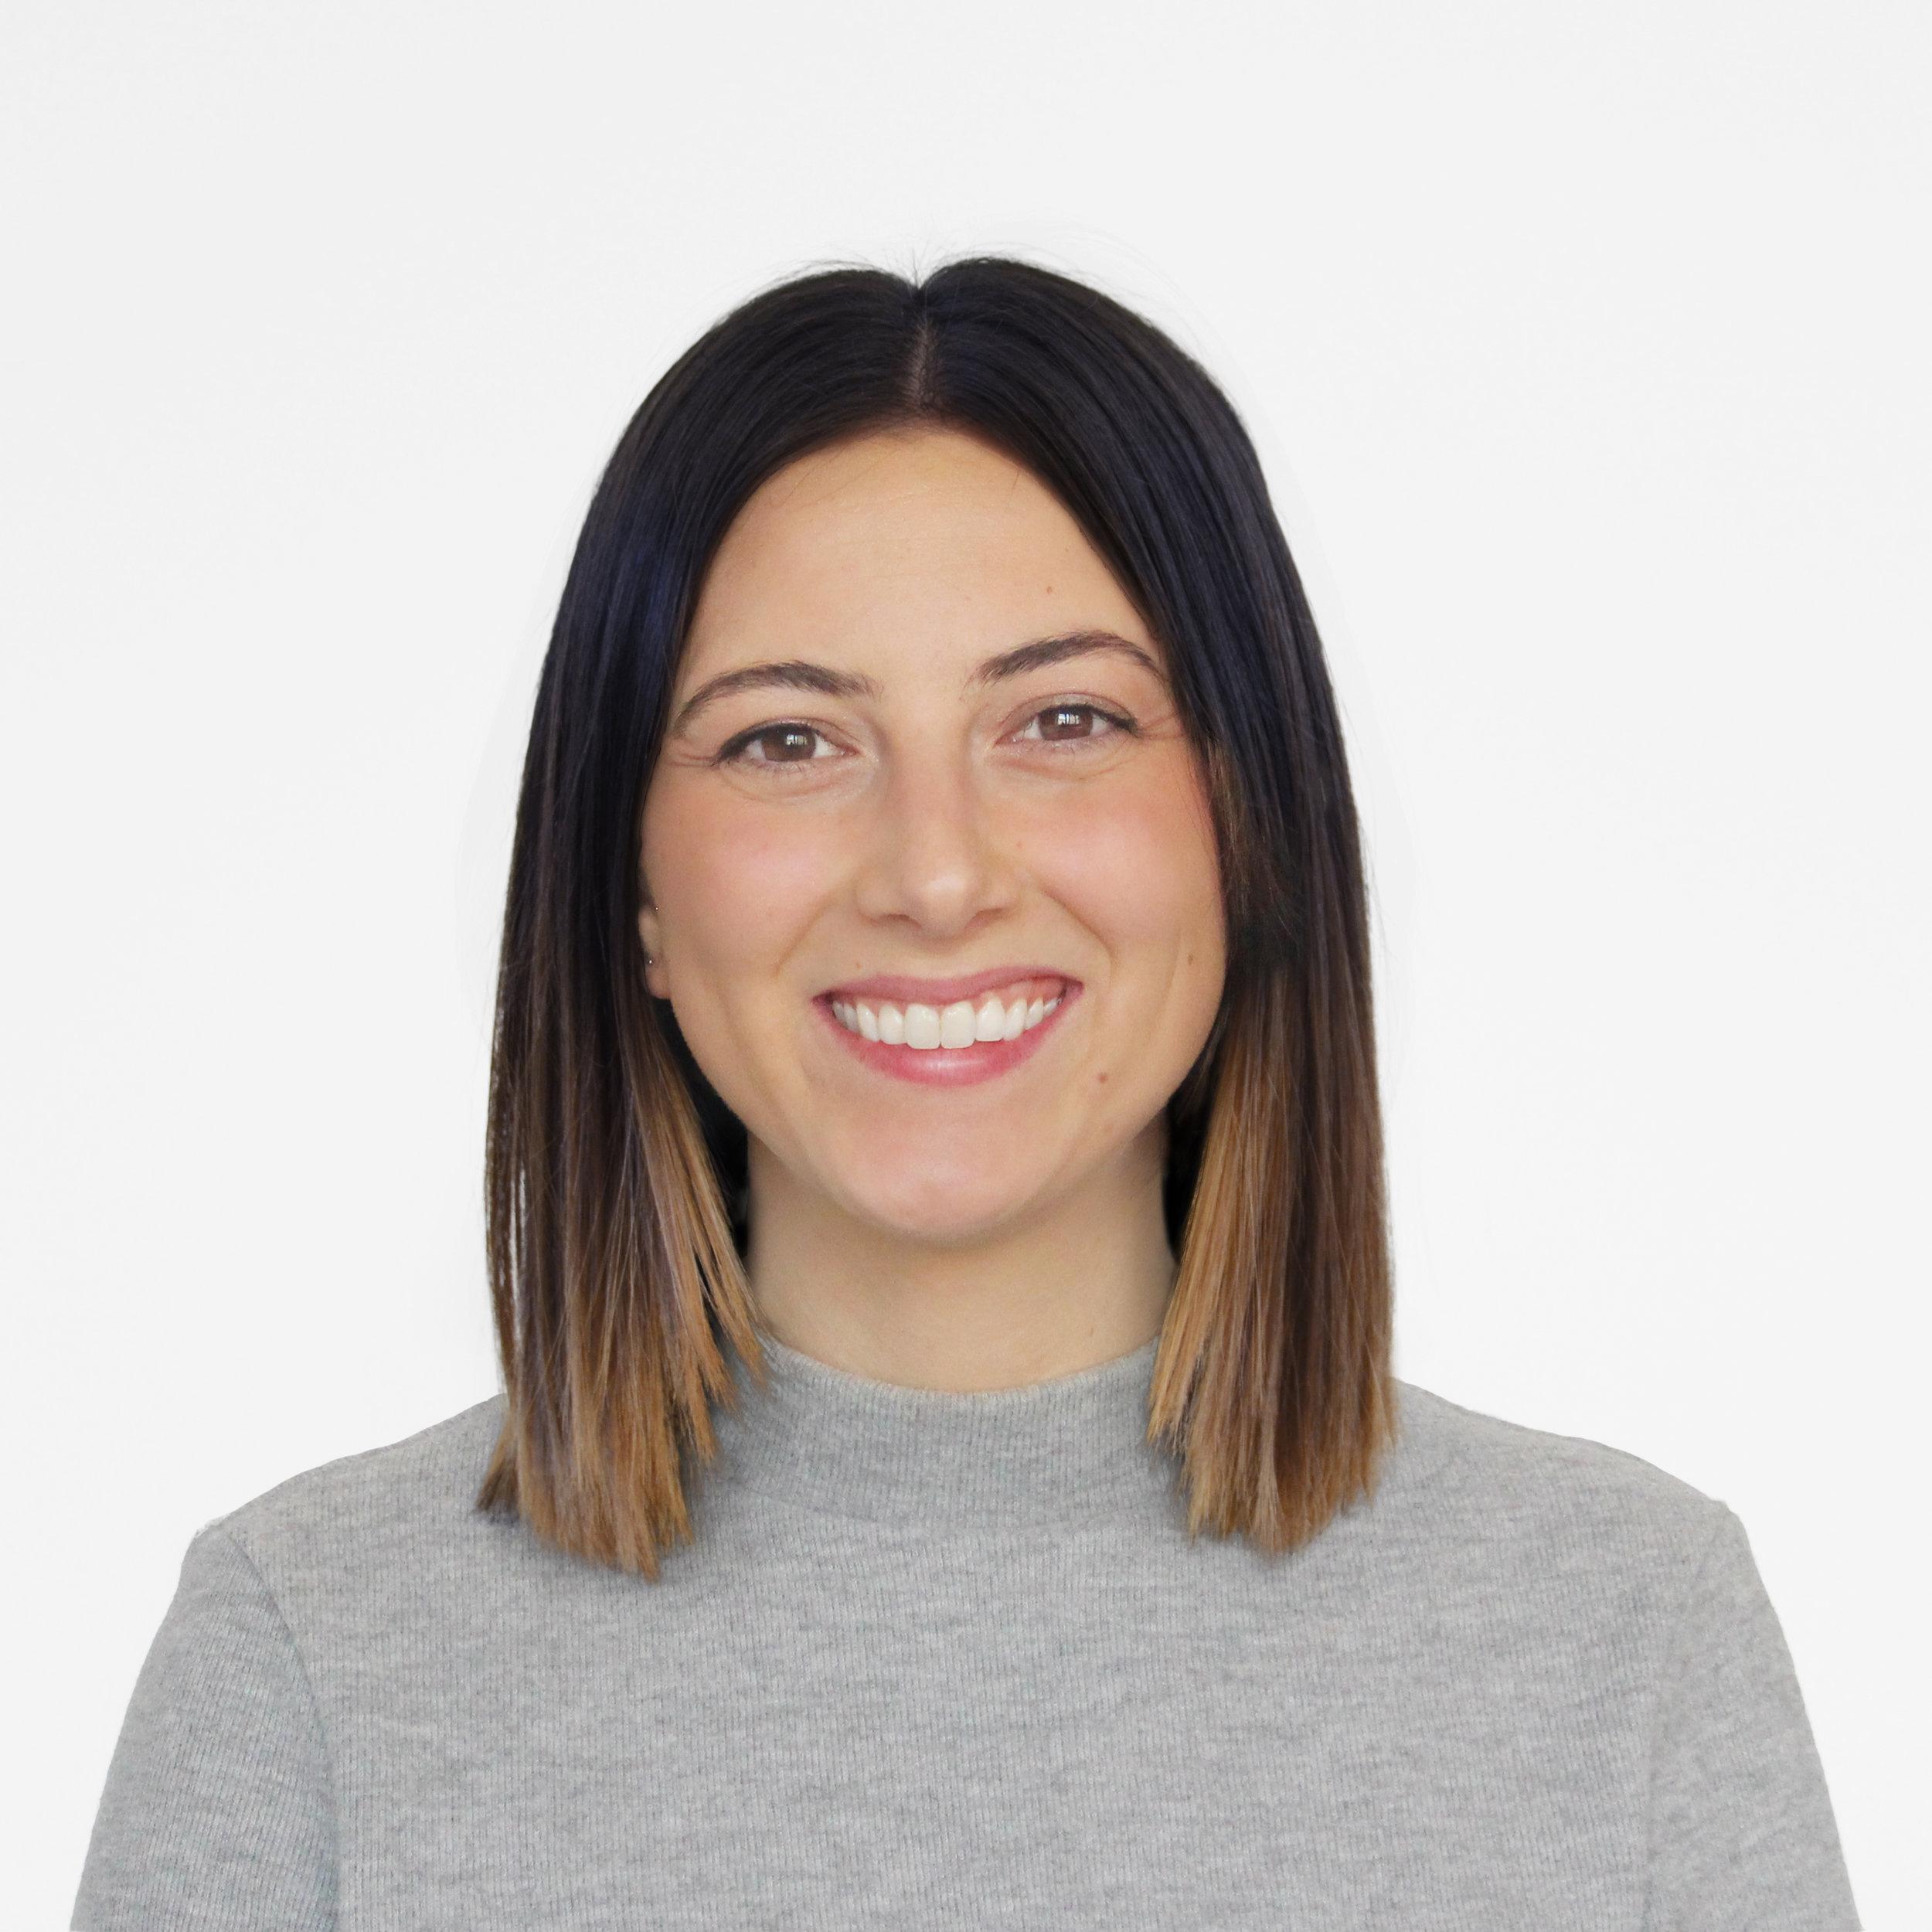 Chelsea DeCrescenzo